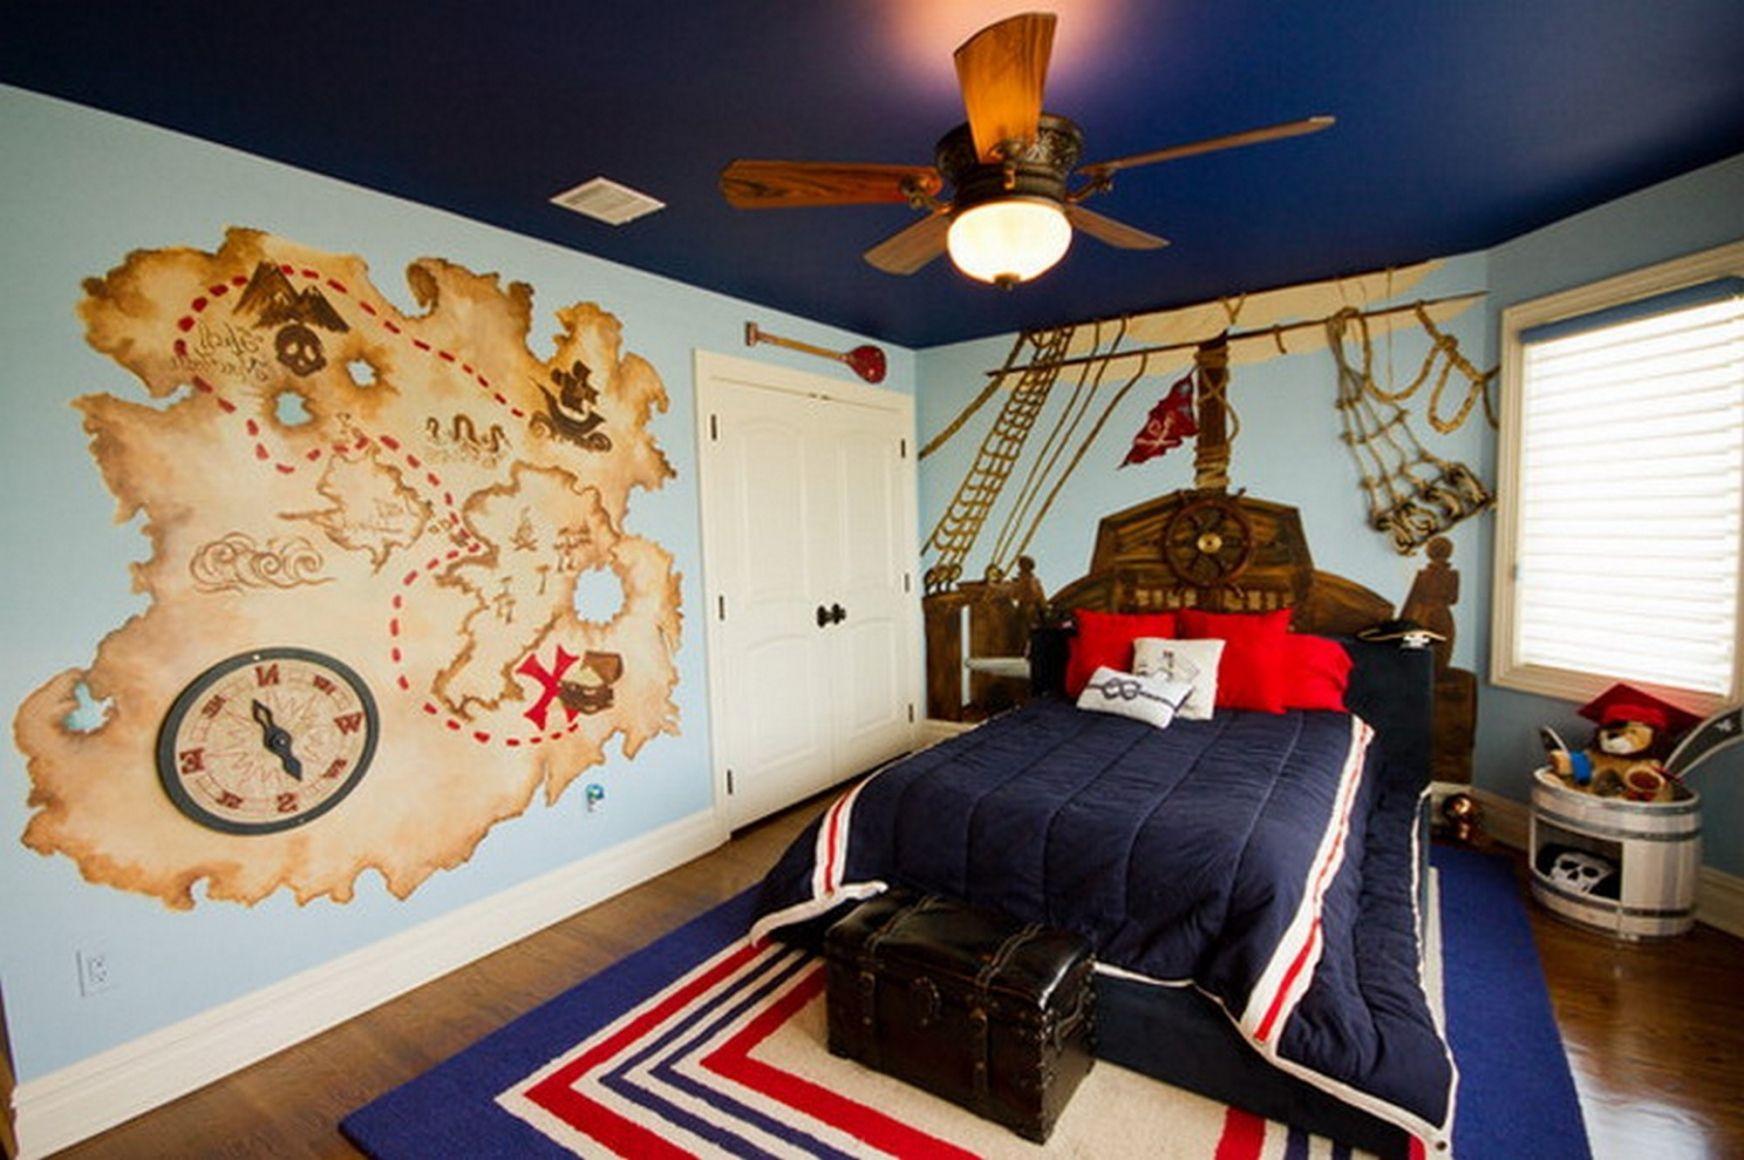 Master bedroom designs as per vastu   Ceiling Fans Kids Bedrooms  Simple Interior Design for Bedroom